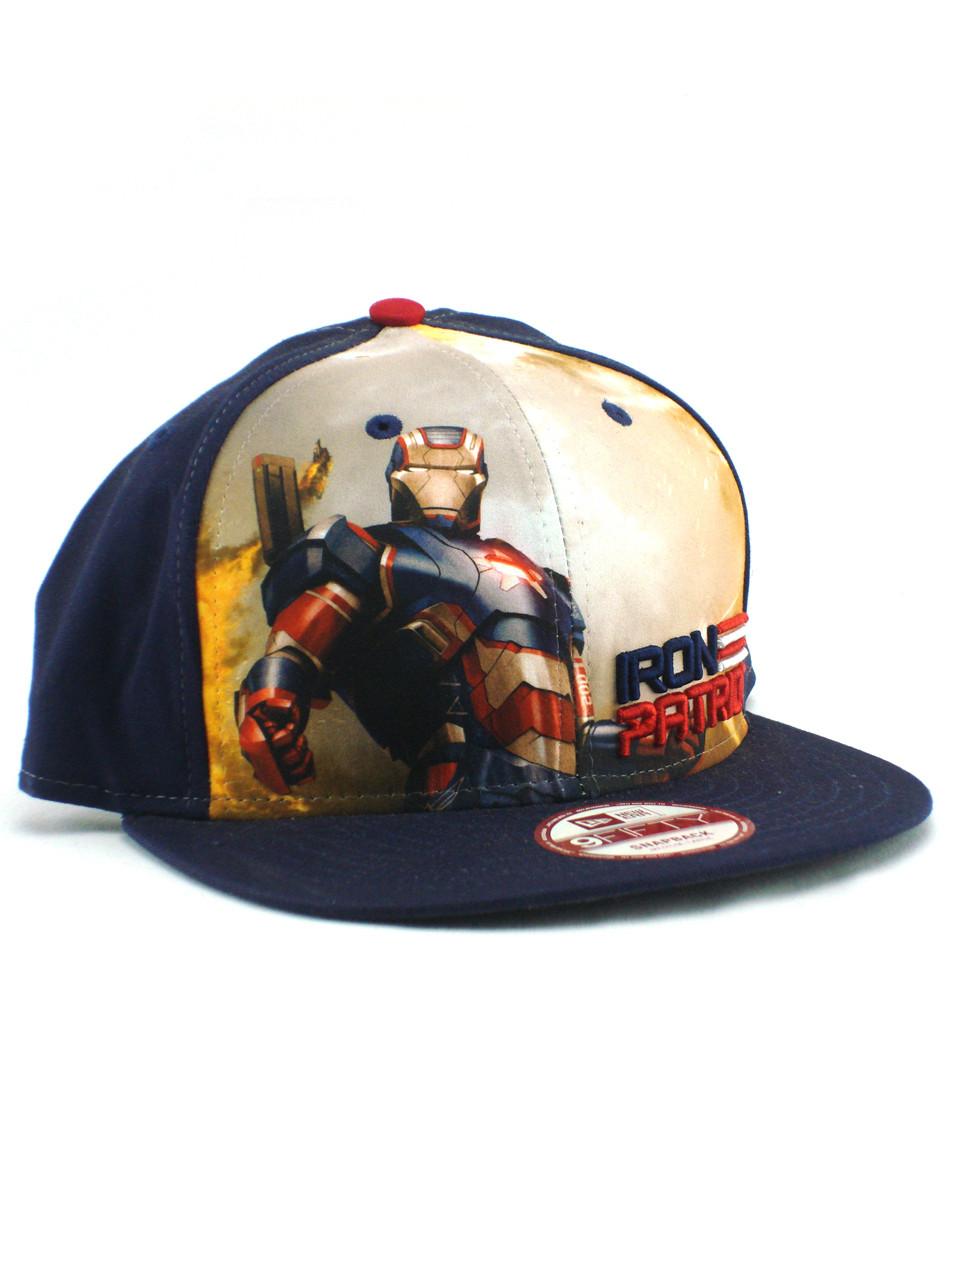 sports shoes 88341 52b09 03086 90383  greece new era iron man 3 iron patriot 9fifty snapback hat  view 1 8d1de bcd62